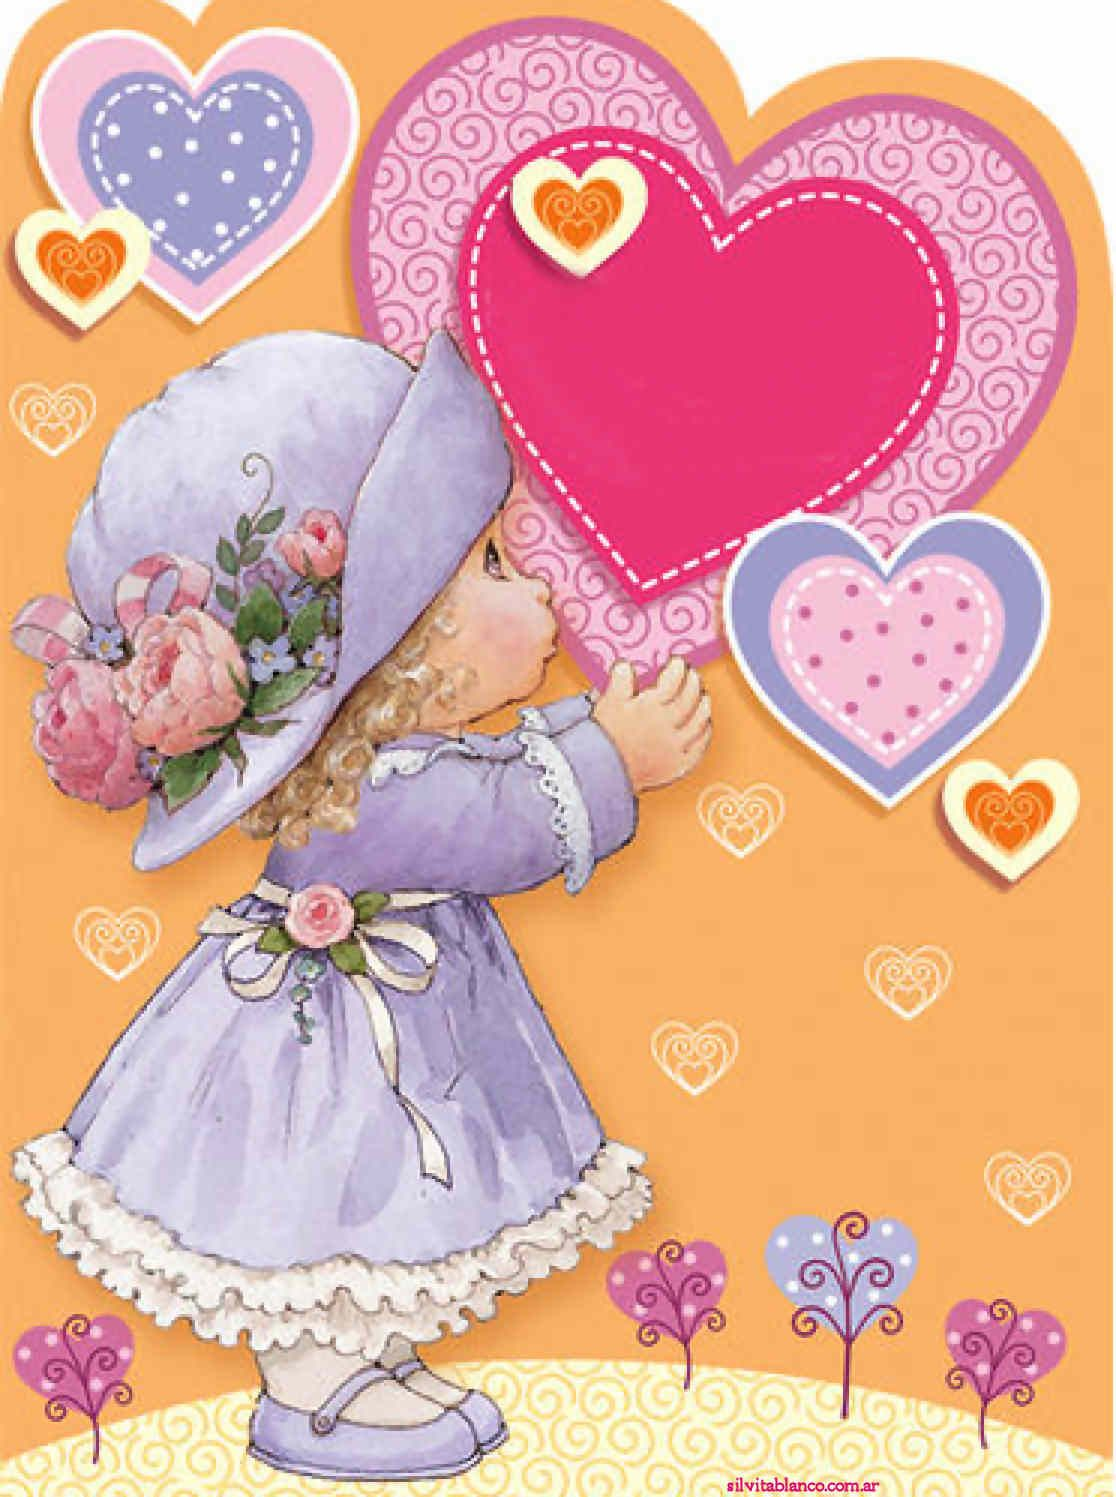 Poema A Mamá Alejandro Latorre Quintanilla Dibujos Bonitos Carpetas Decoradas Para Preescolar Hijos Preciosos